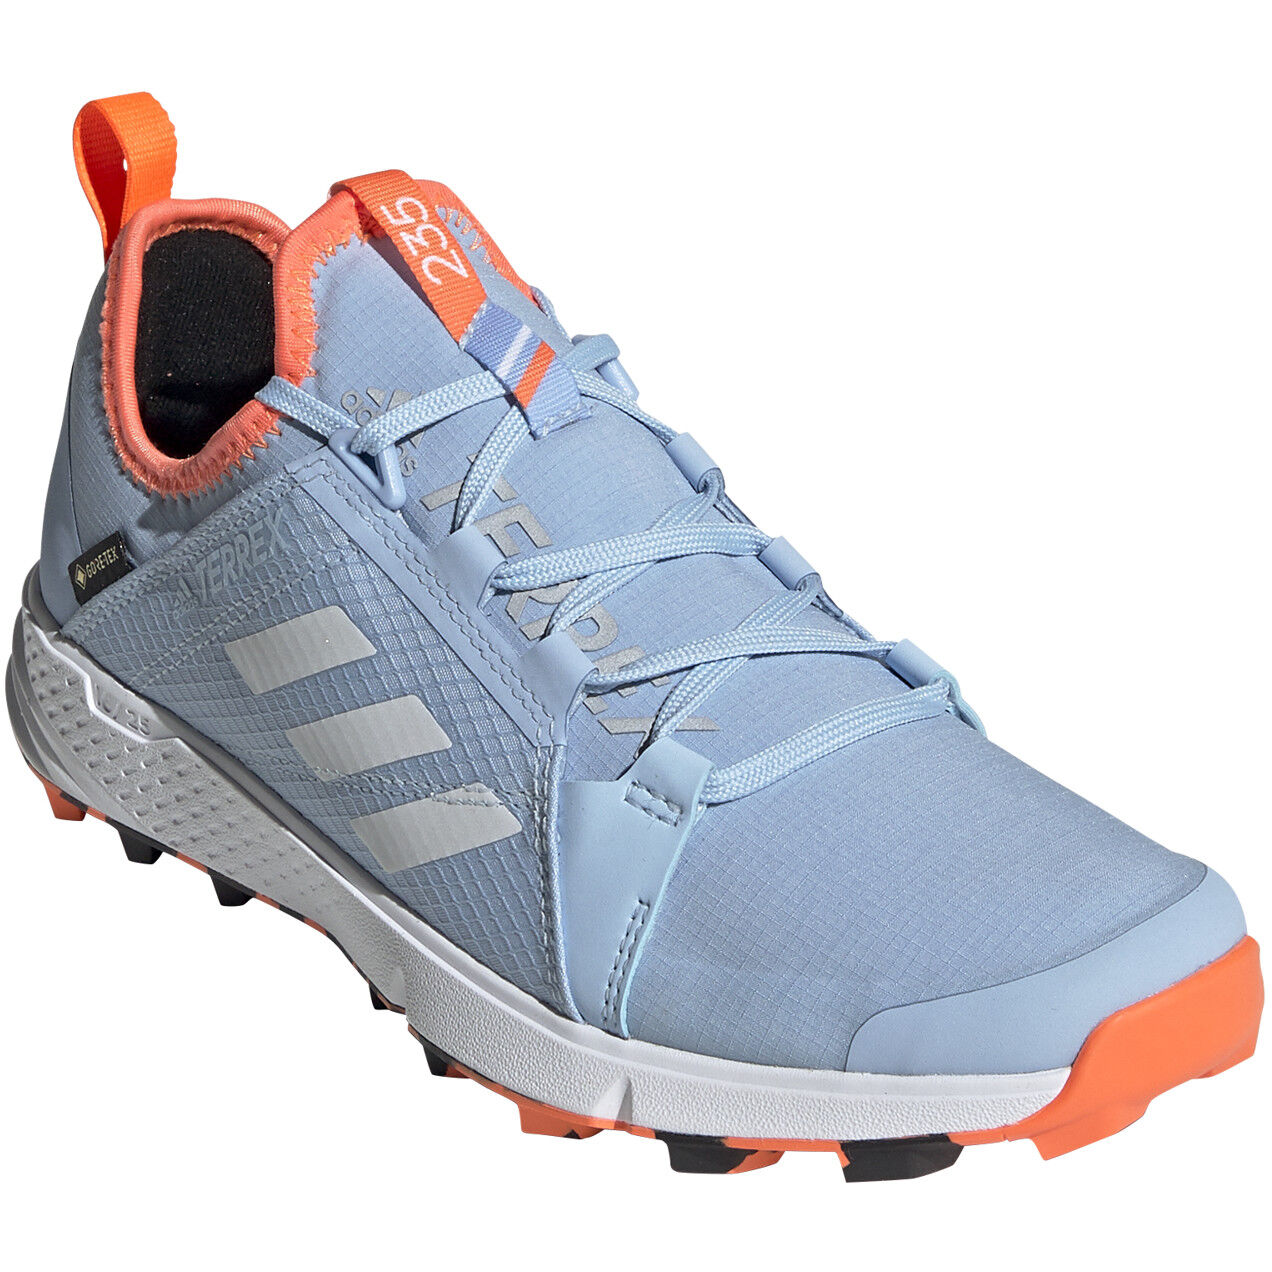 Speed Agravic Terrex adidas Trailrunningschuhe Black Core